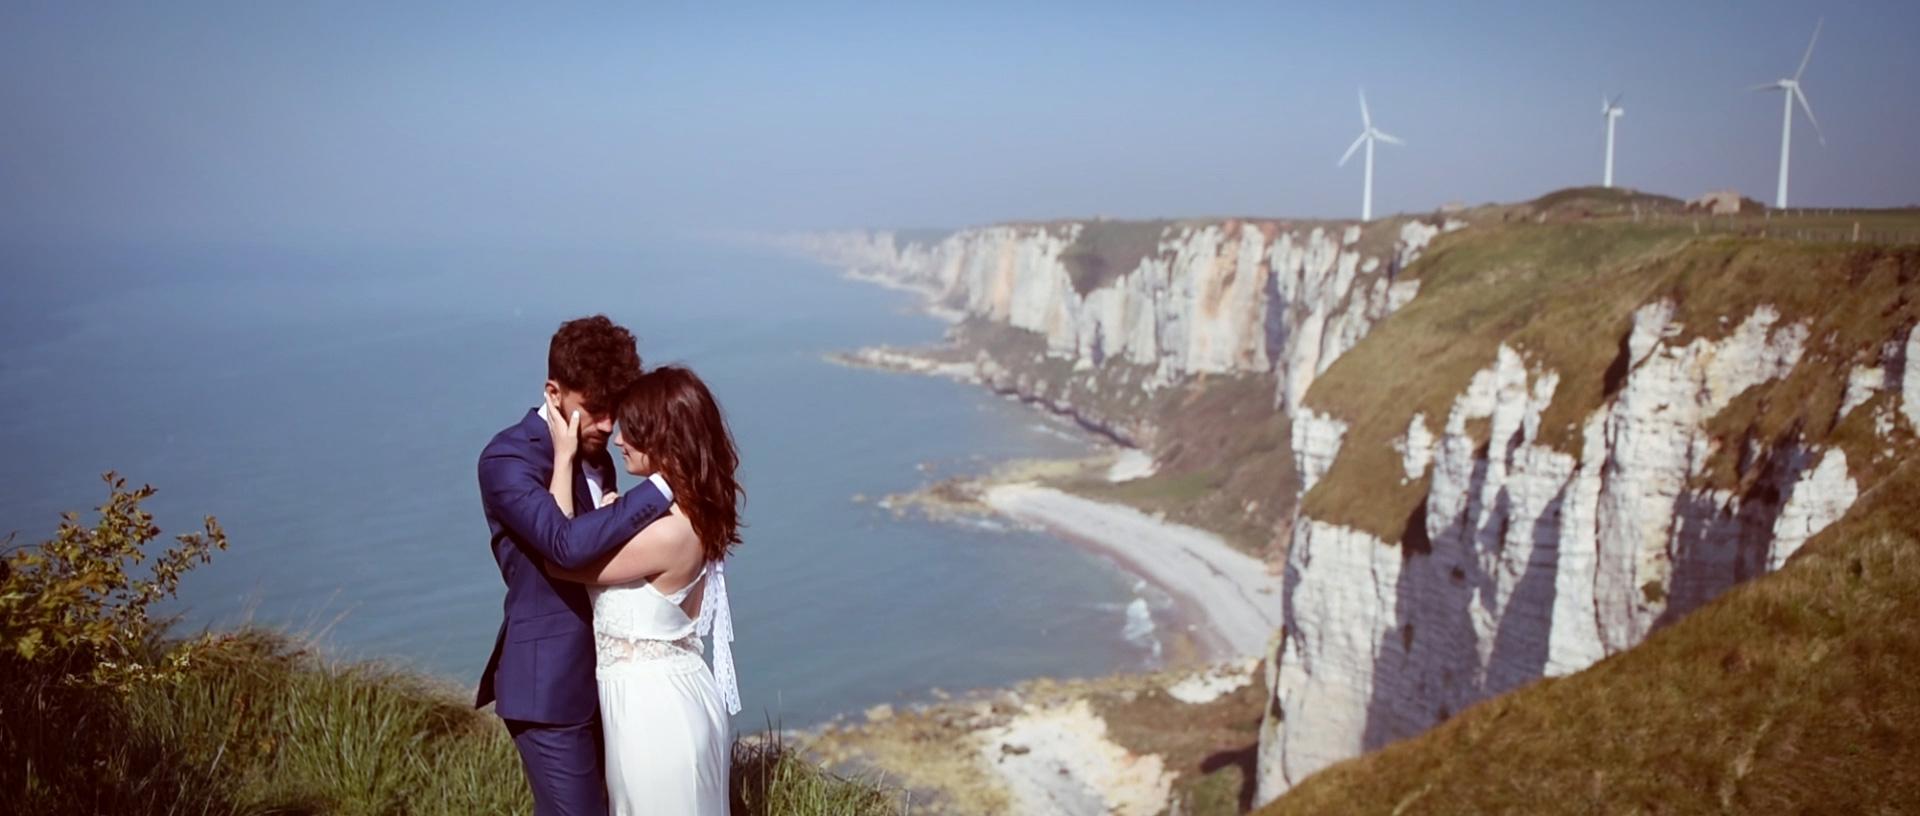 Wedding videographer filmmaker - Destination wedding in France - Normandy